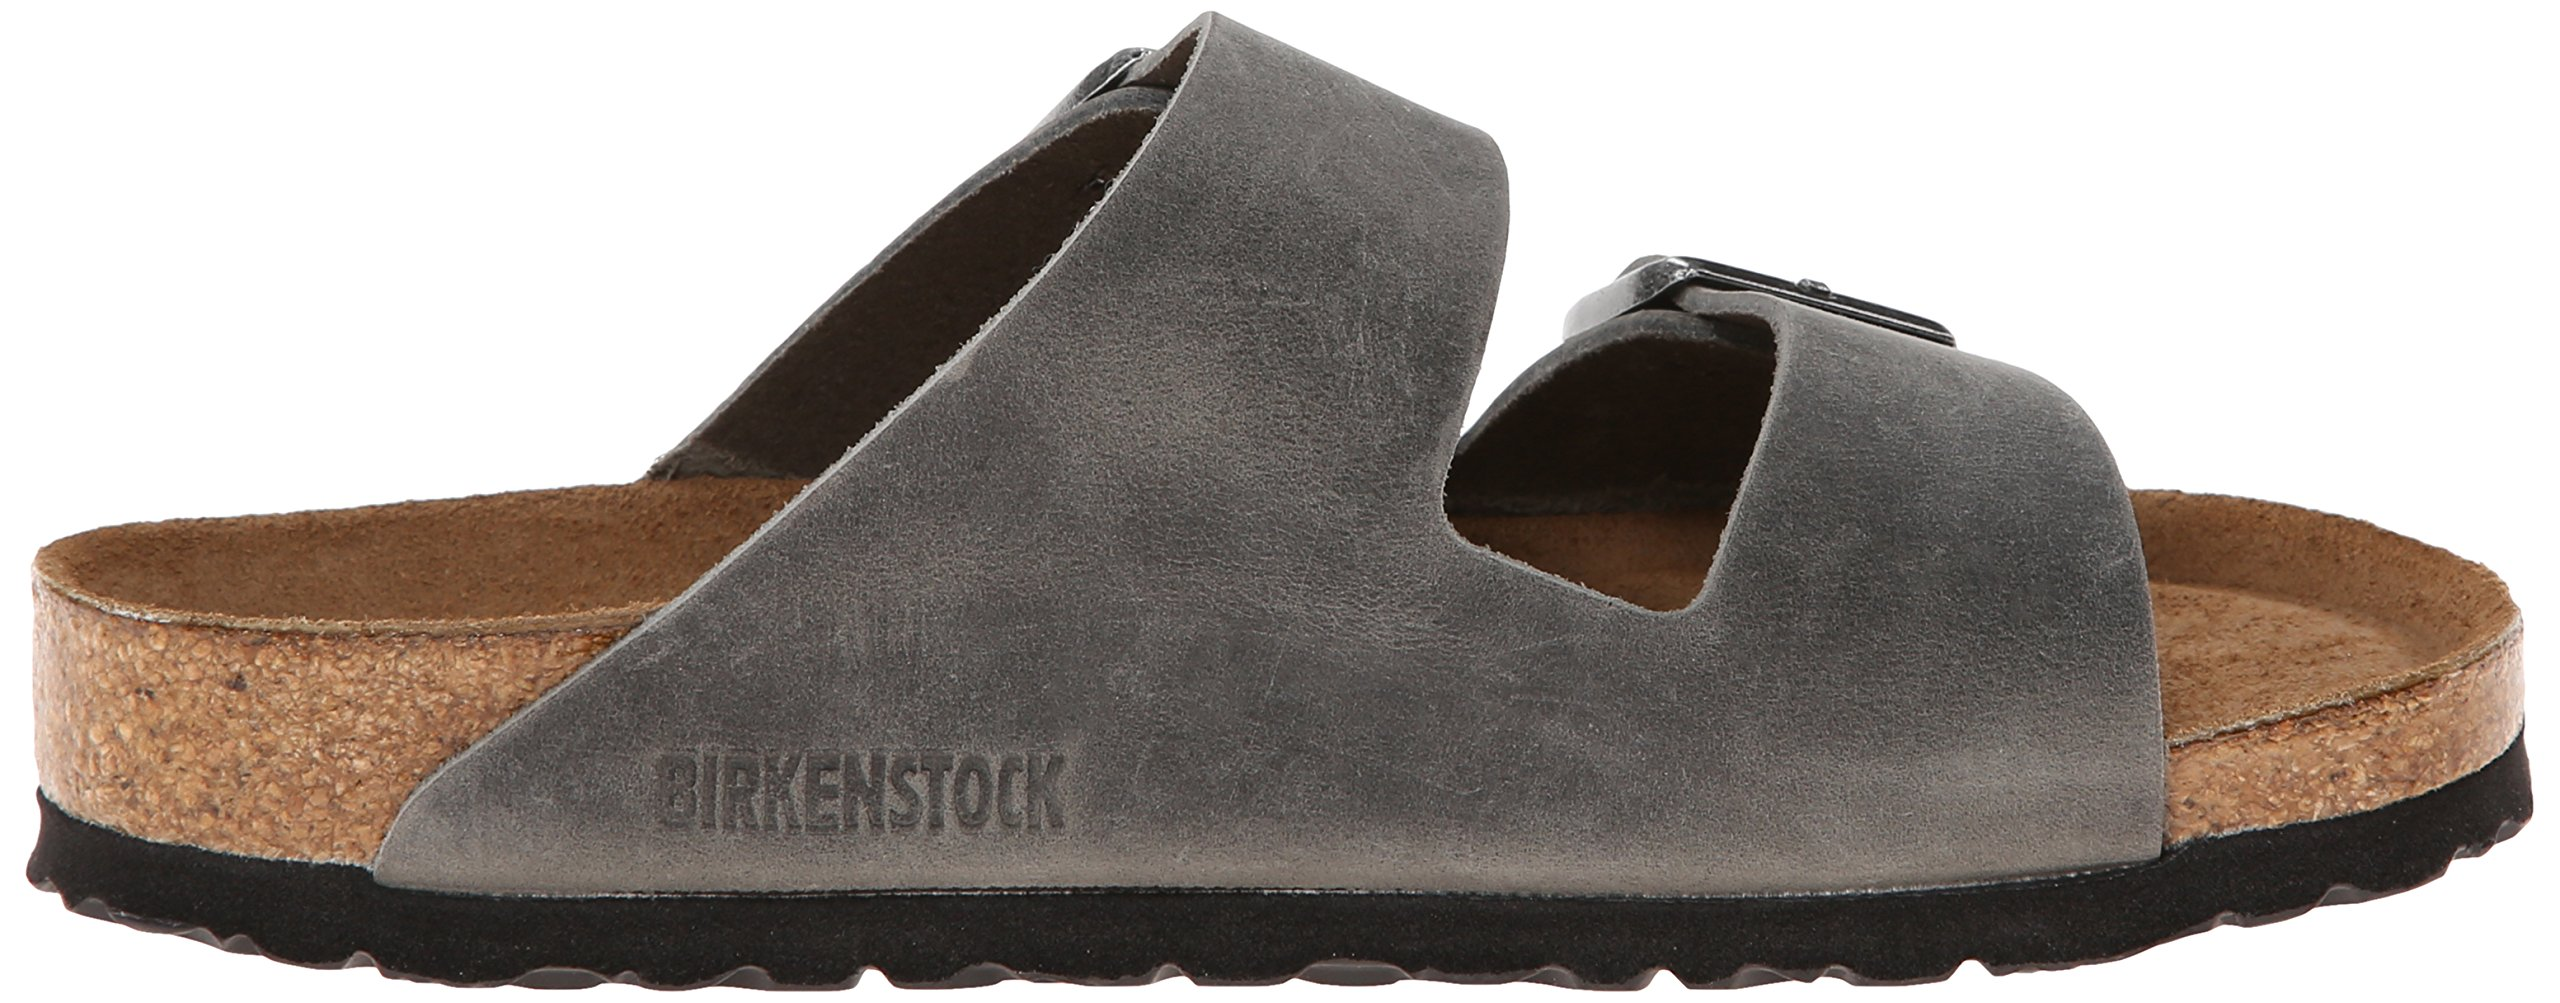 Birkenstock Unisex Arizona Iron Oiled Leather Sandals - 45 M EU/12-12.5 B(M) US Men by Birkenstock (Image #7)